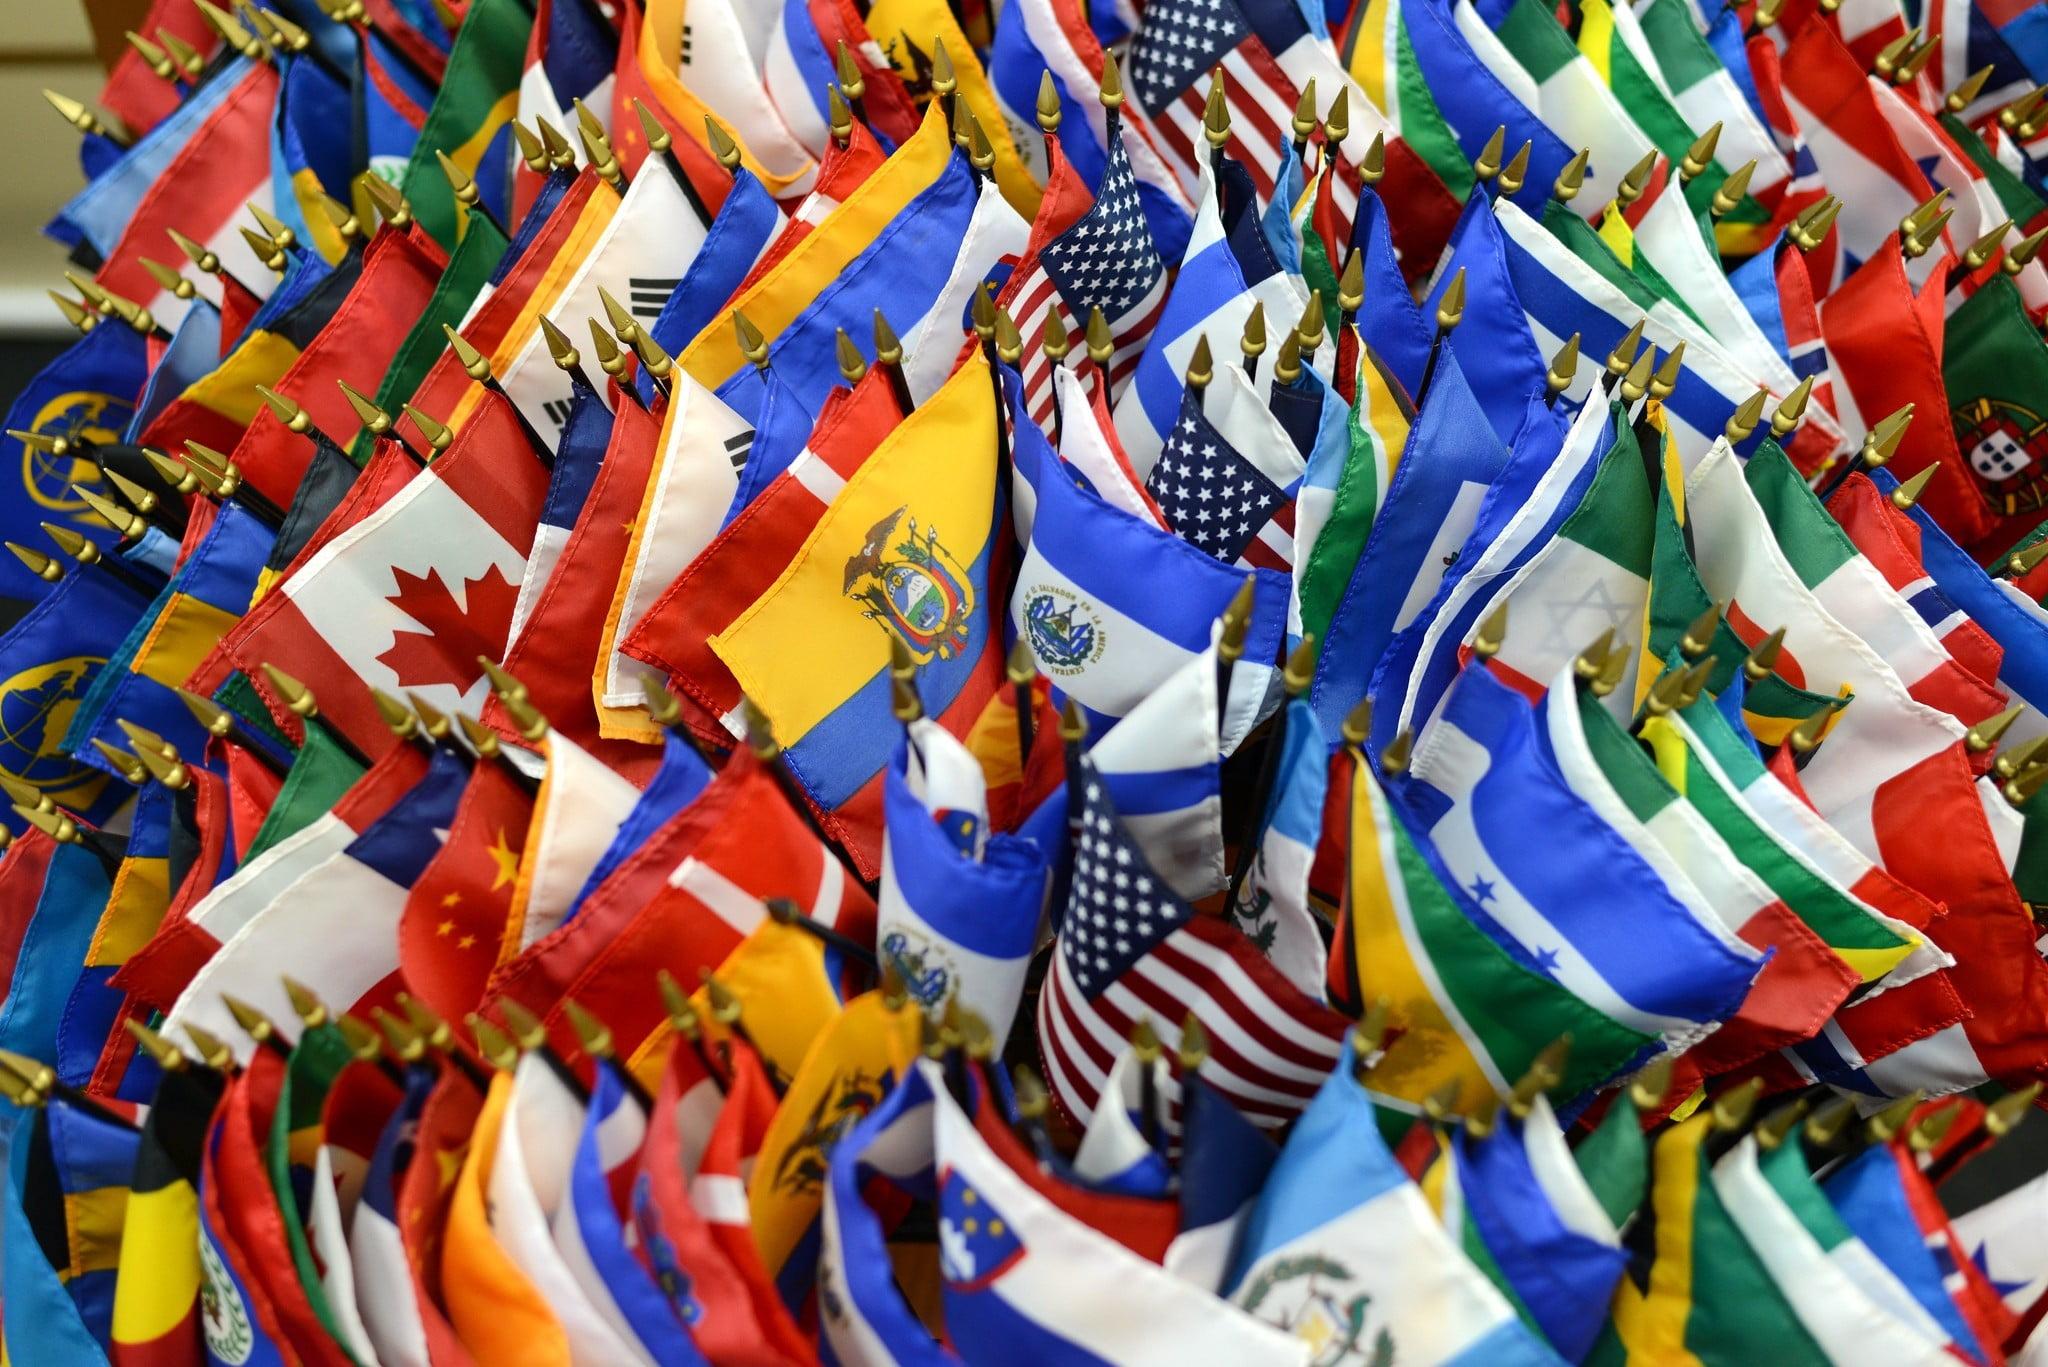 economía latinoamericana, América Latina, Latinoamérica, banderas